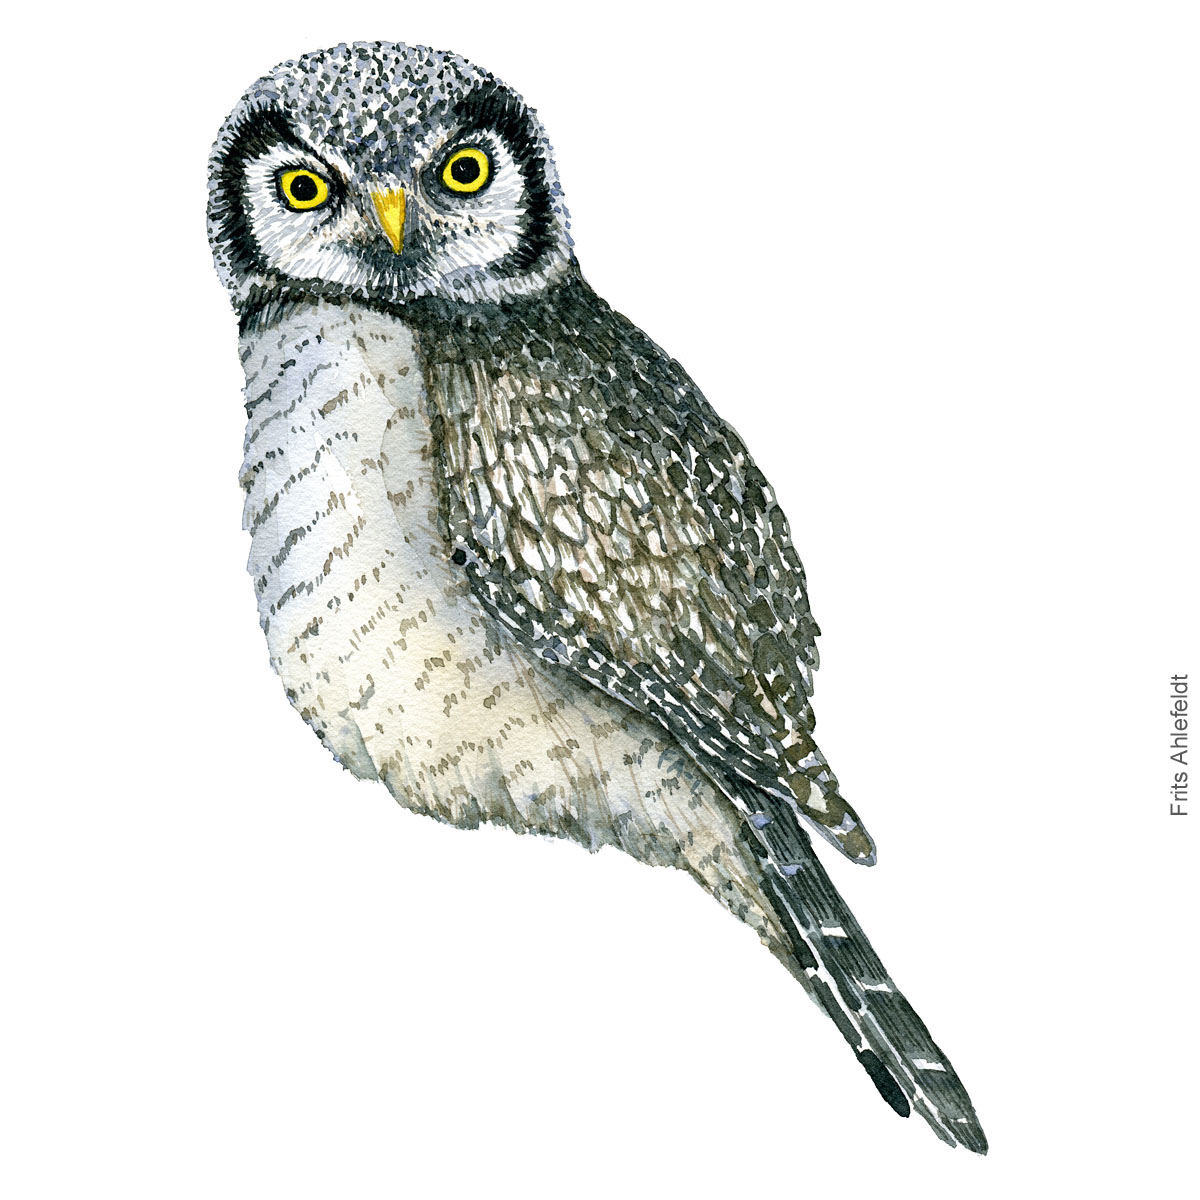 Hoegeugle - Northen hawk owl - Bird watercolor painting. Artwork by Frits Ahlefeldt. Fugle akvarel